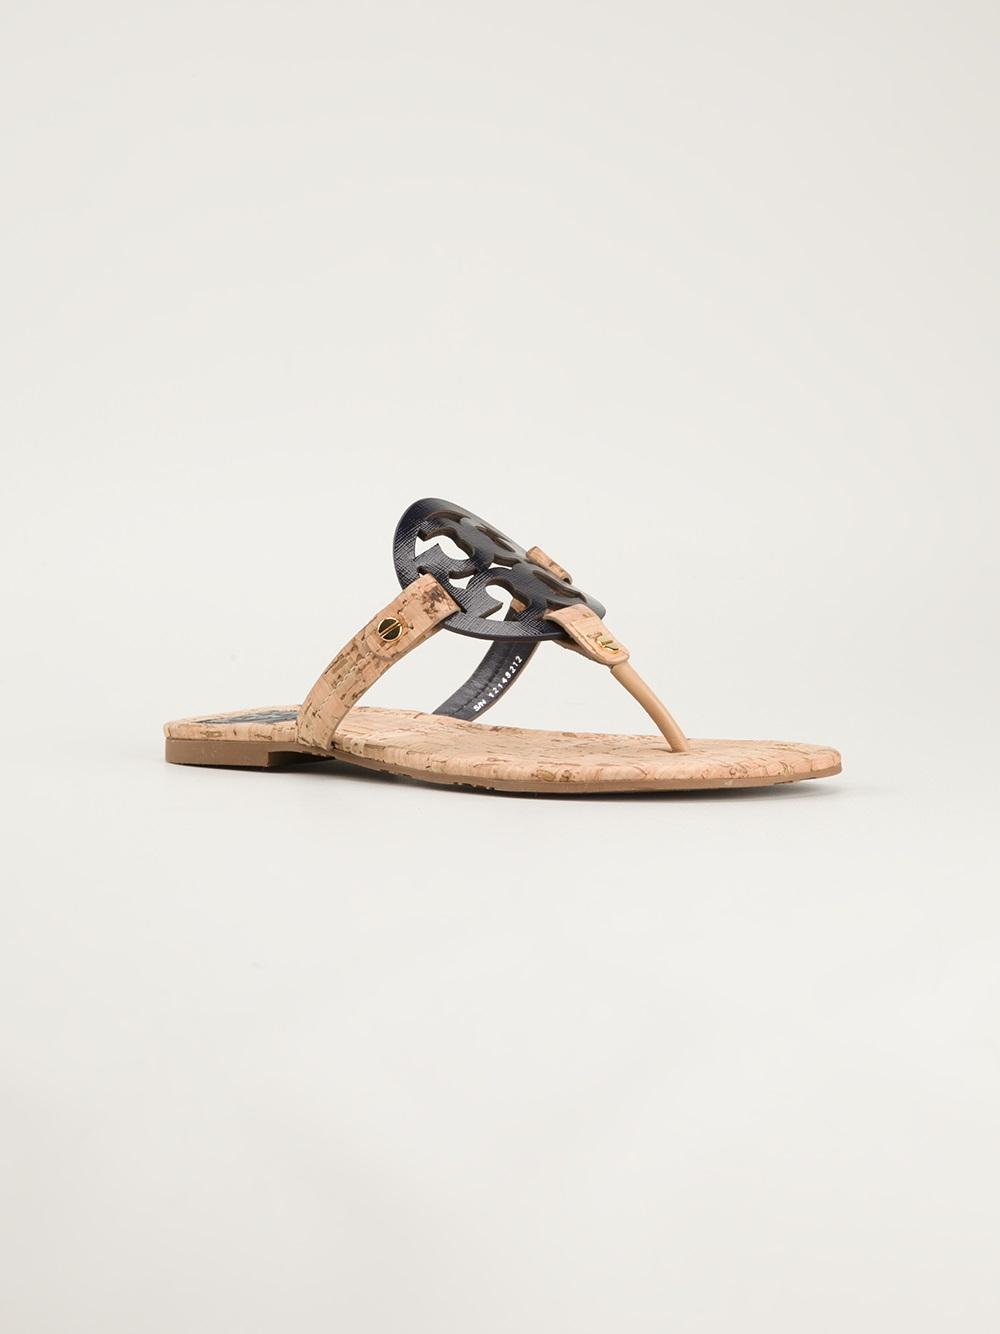 3e1d4efbd189 Lyst - Tory Burch Miller Sandals in Natural